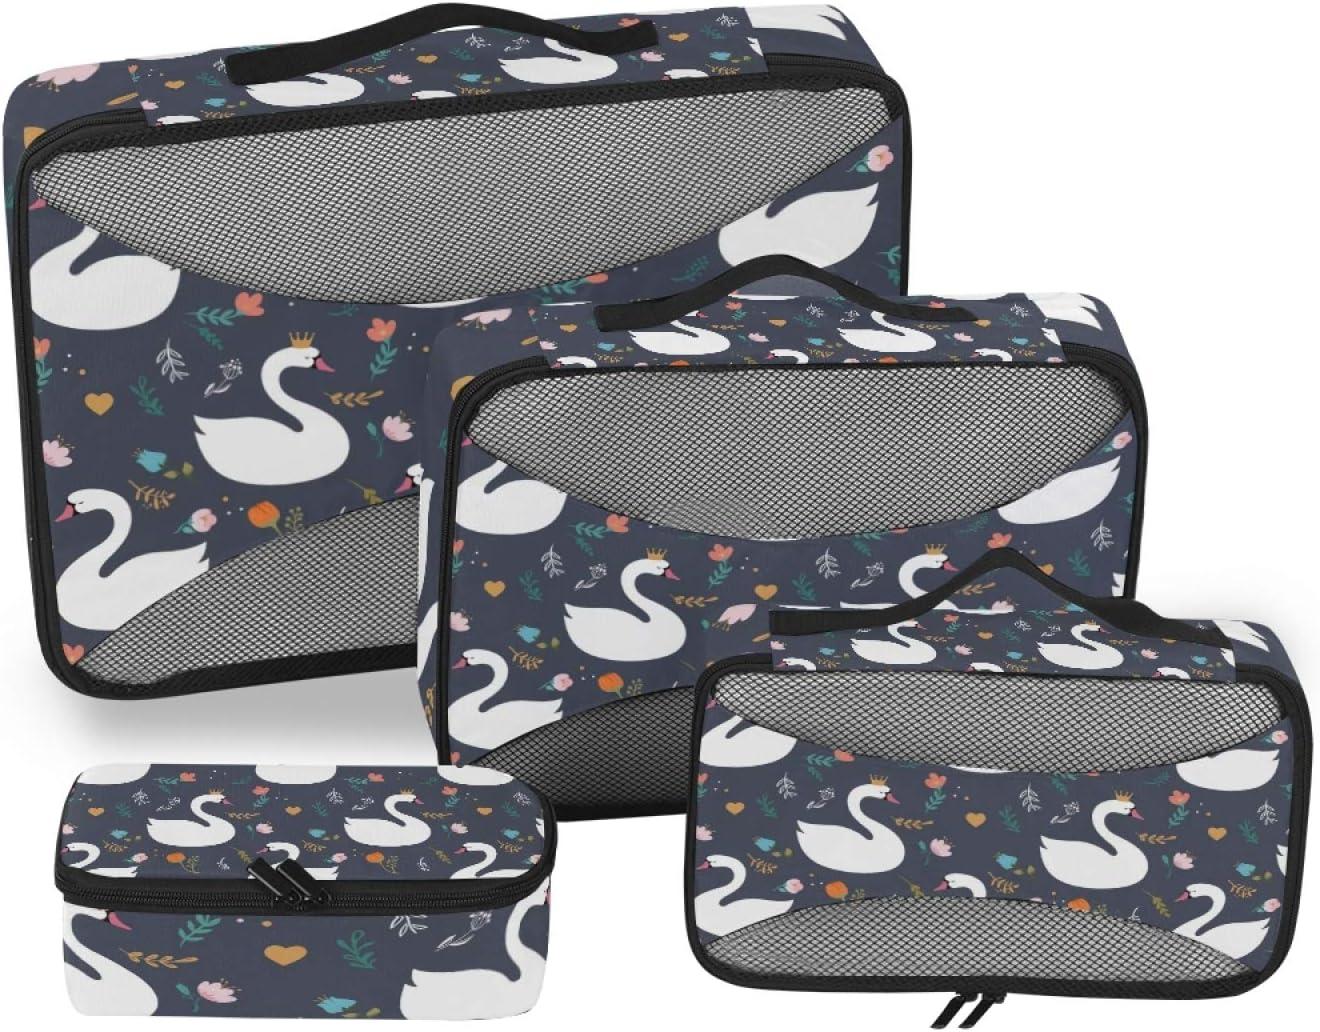 SALENEW very popular! Swan Packing Storage Bag 4-Pcs Accessories Stor Ranking TOP9 Organizer Travel